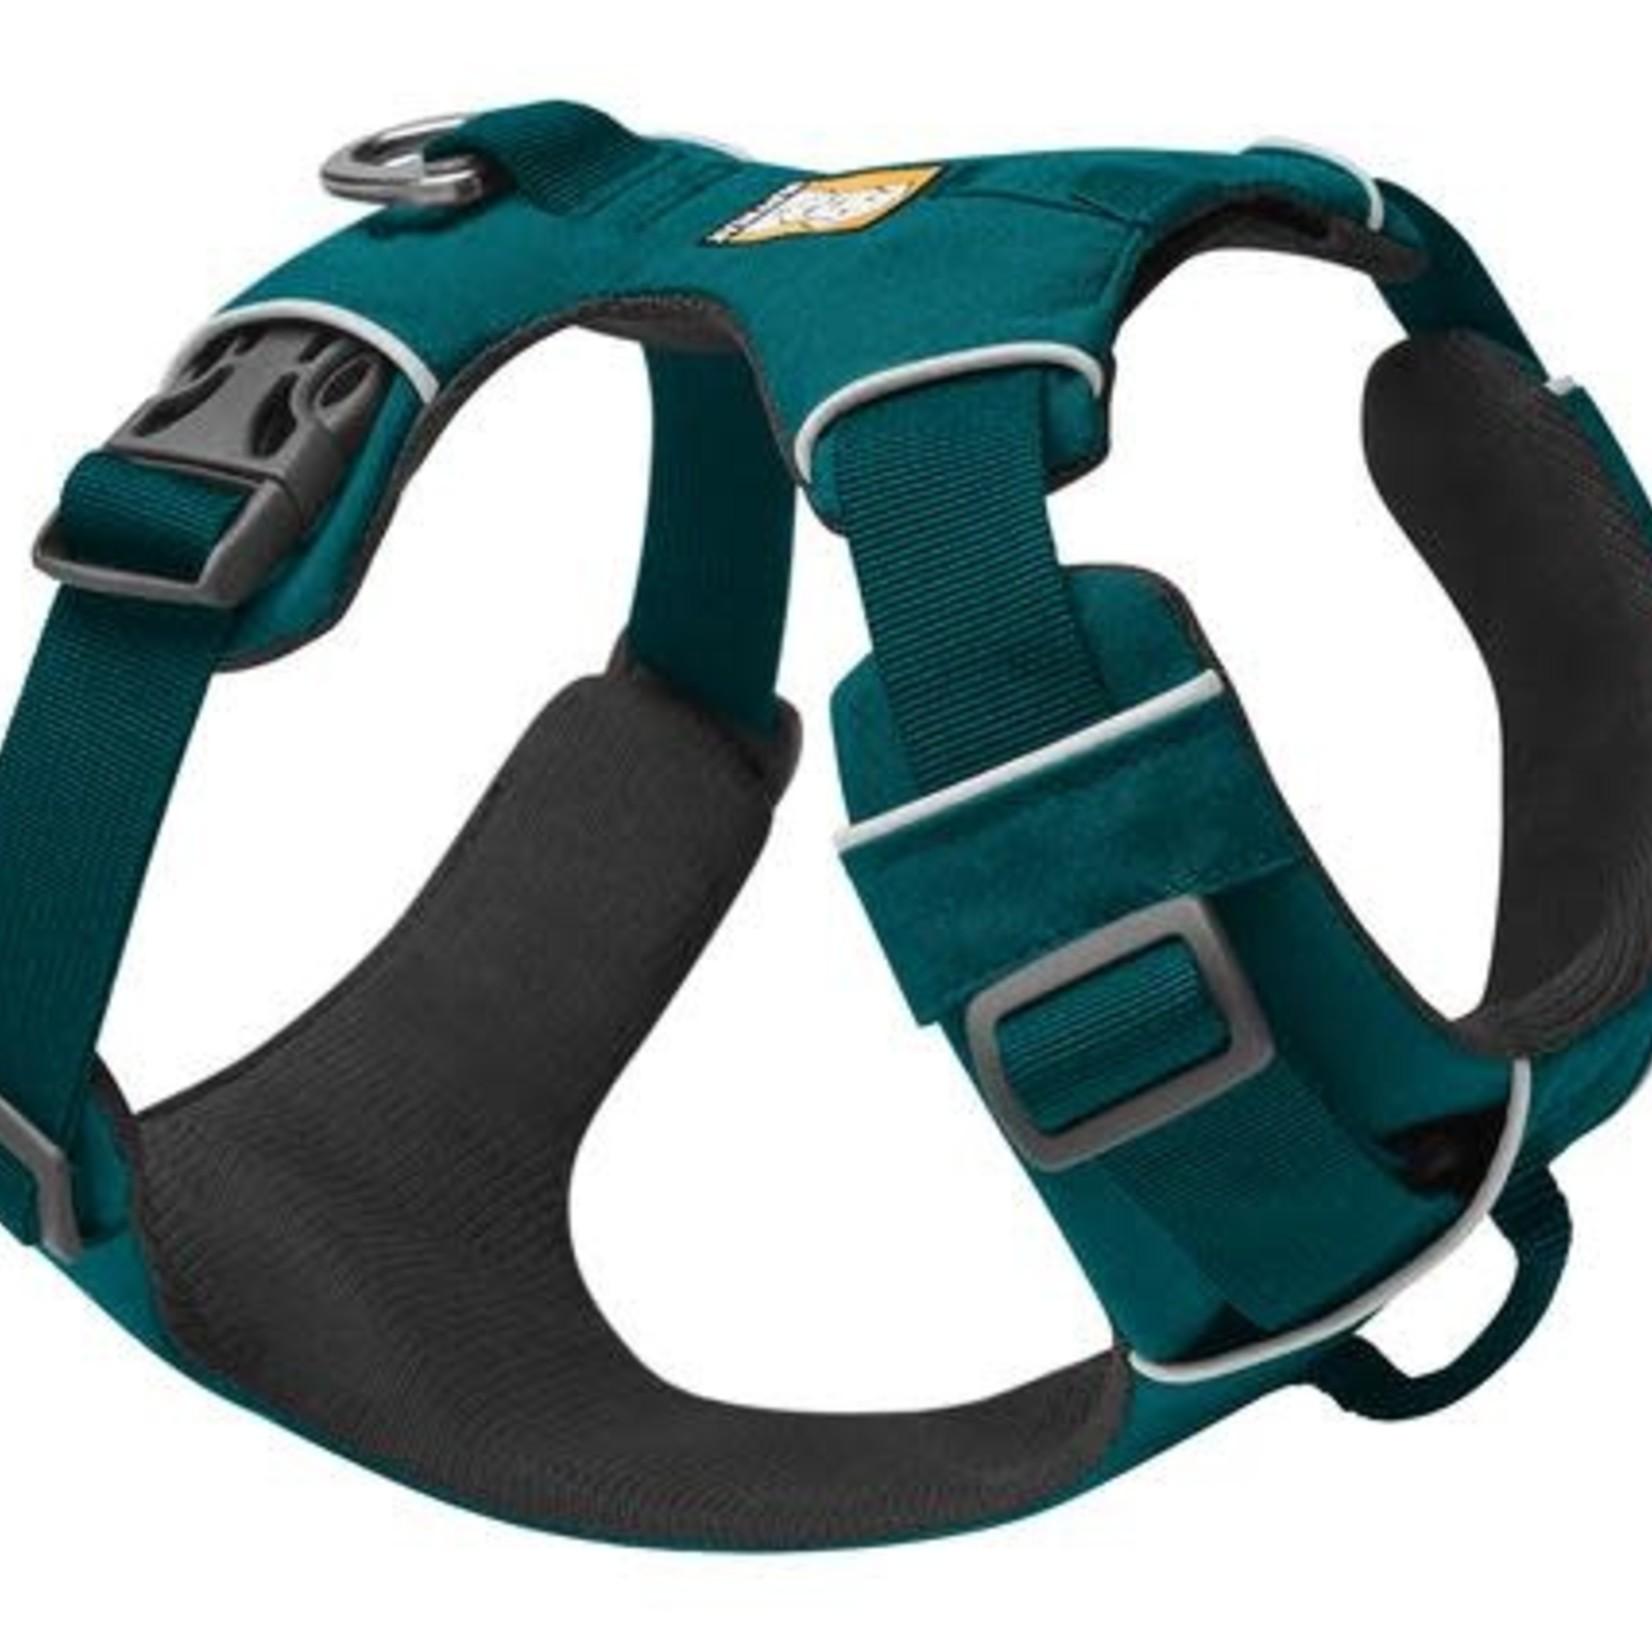 Ruff Wear Ruffwear Front Range Harness Tumalo Teal X-Small